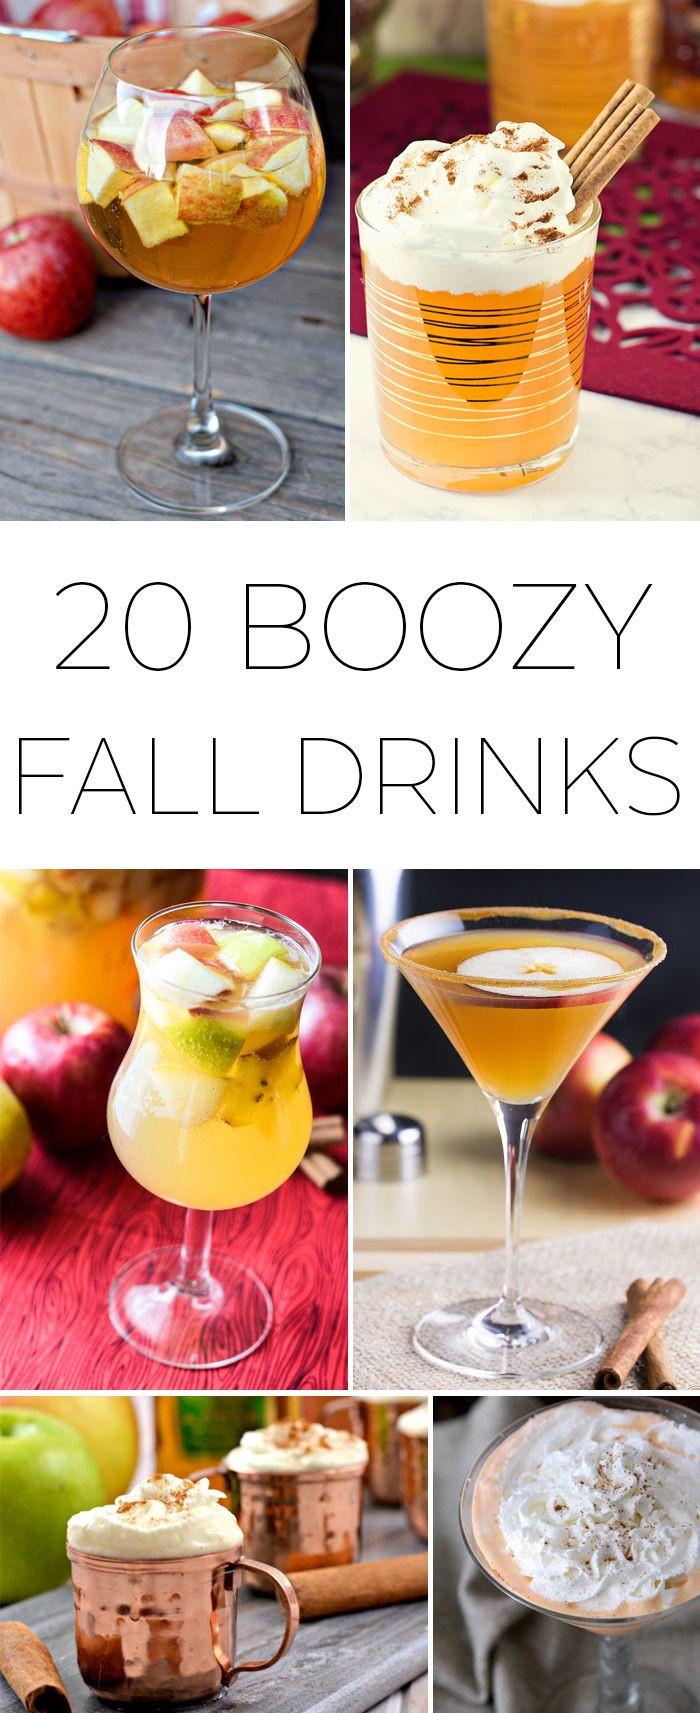 Fun Thanksgiving Drinks  20 Boozy Fall Drinks